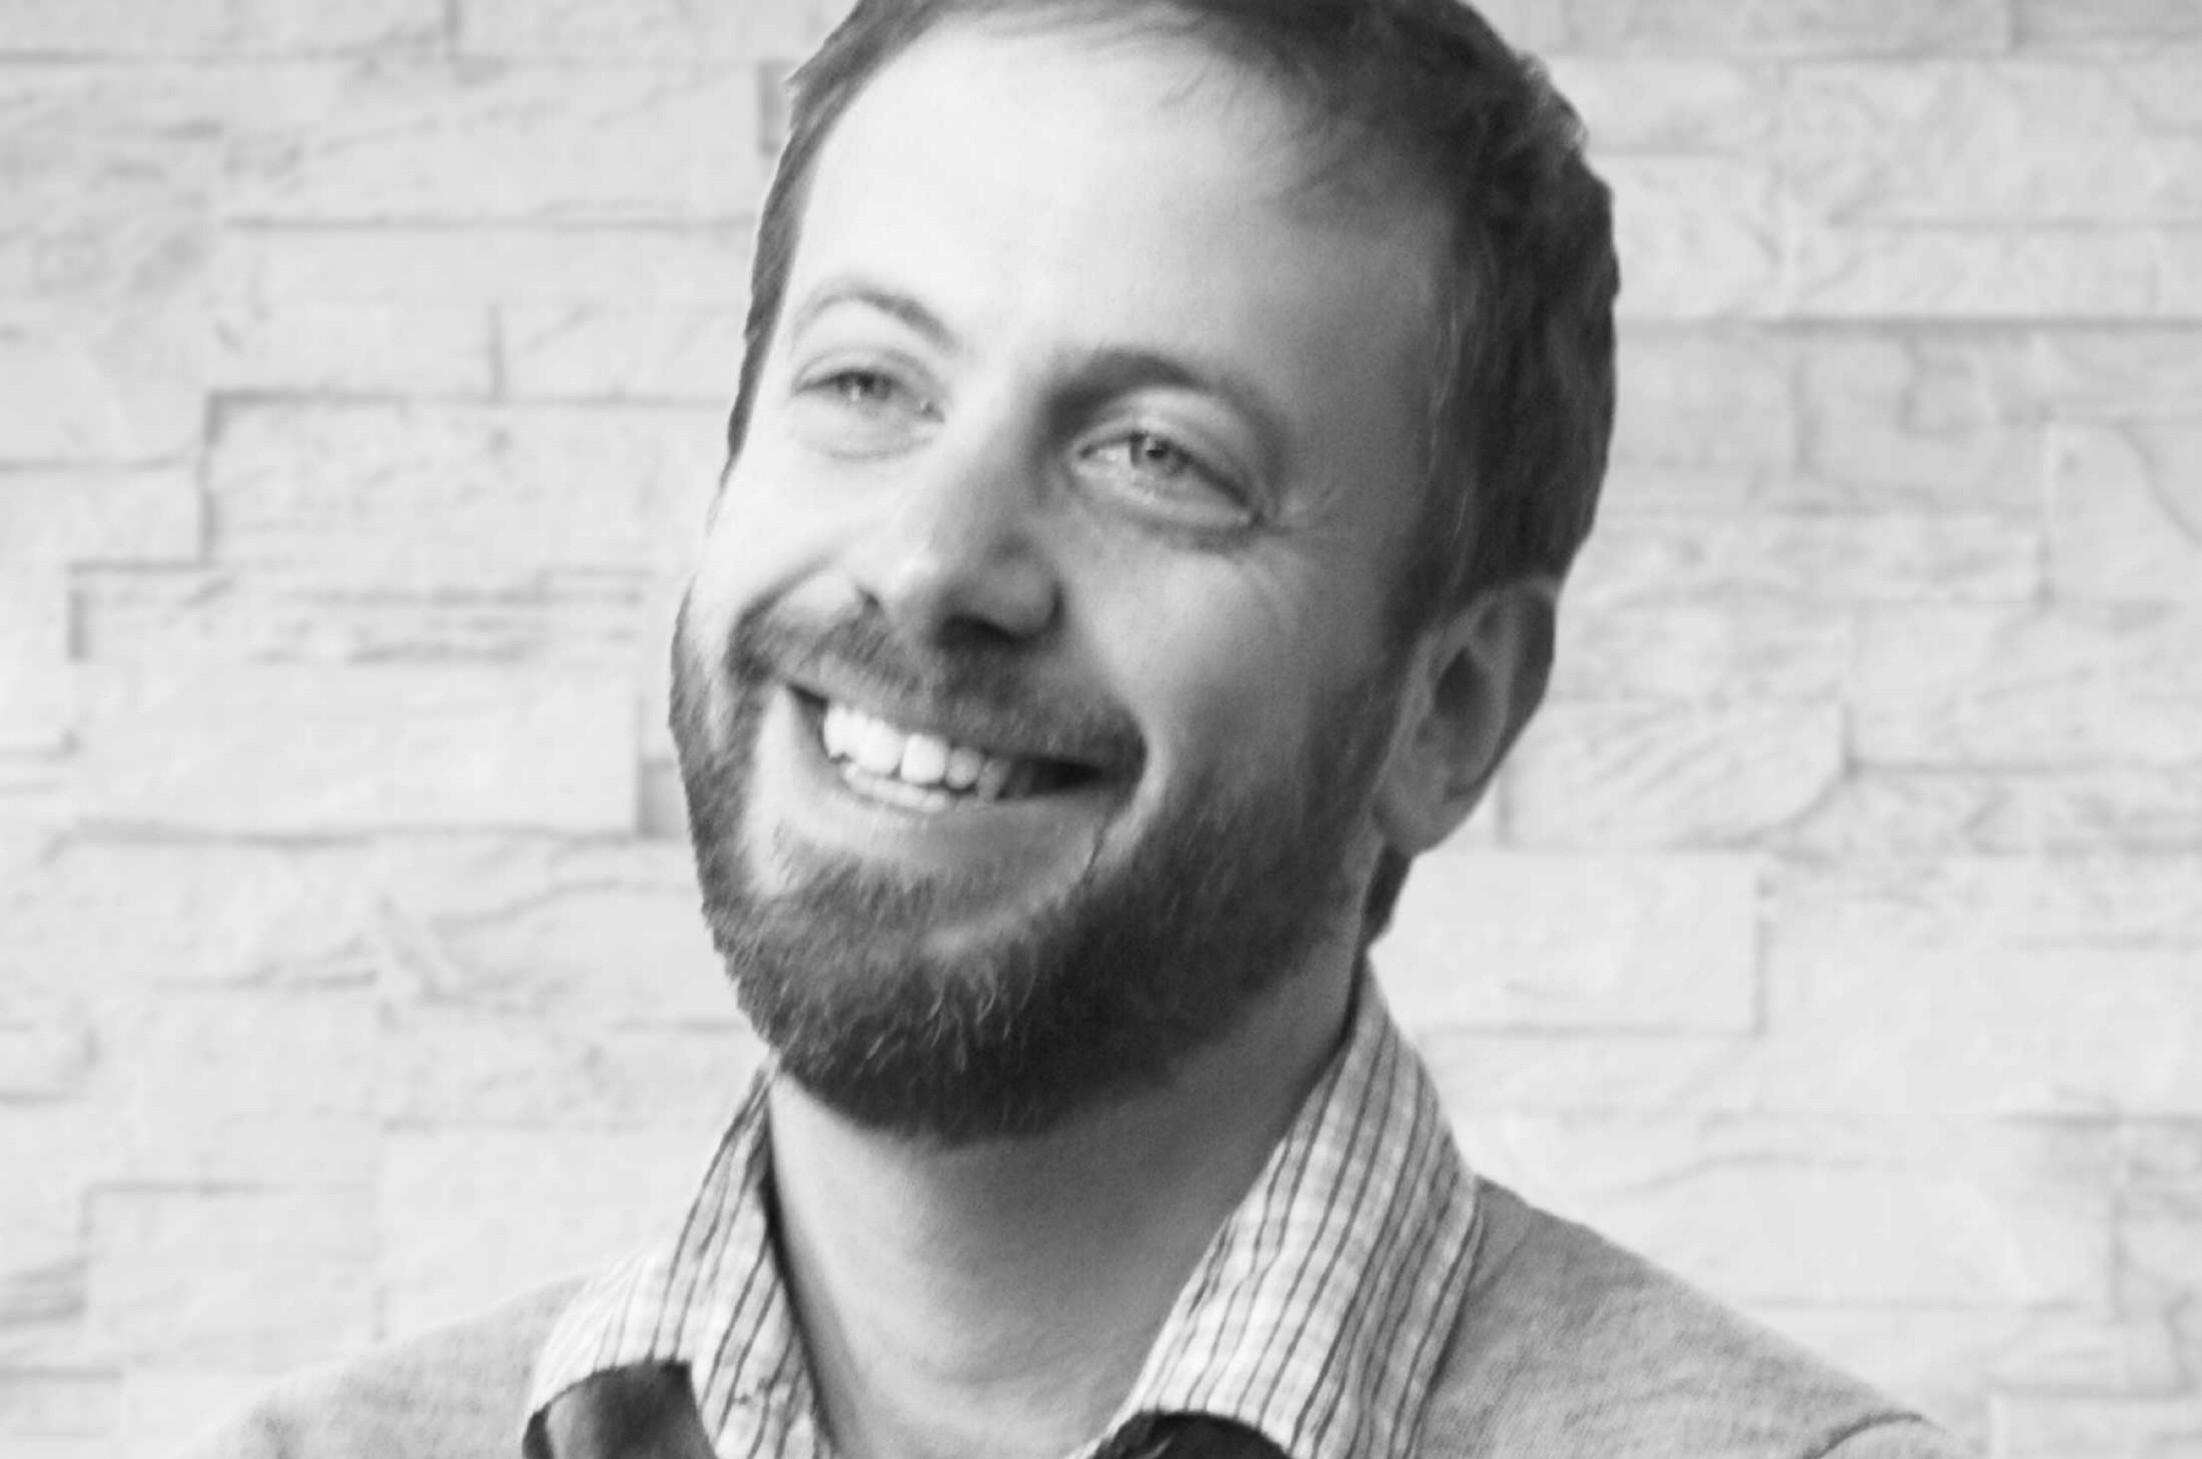 Democracy Crusader Dave Meslin joins ASG as Senior Associate for Democratic Innovation